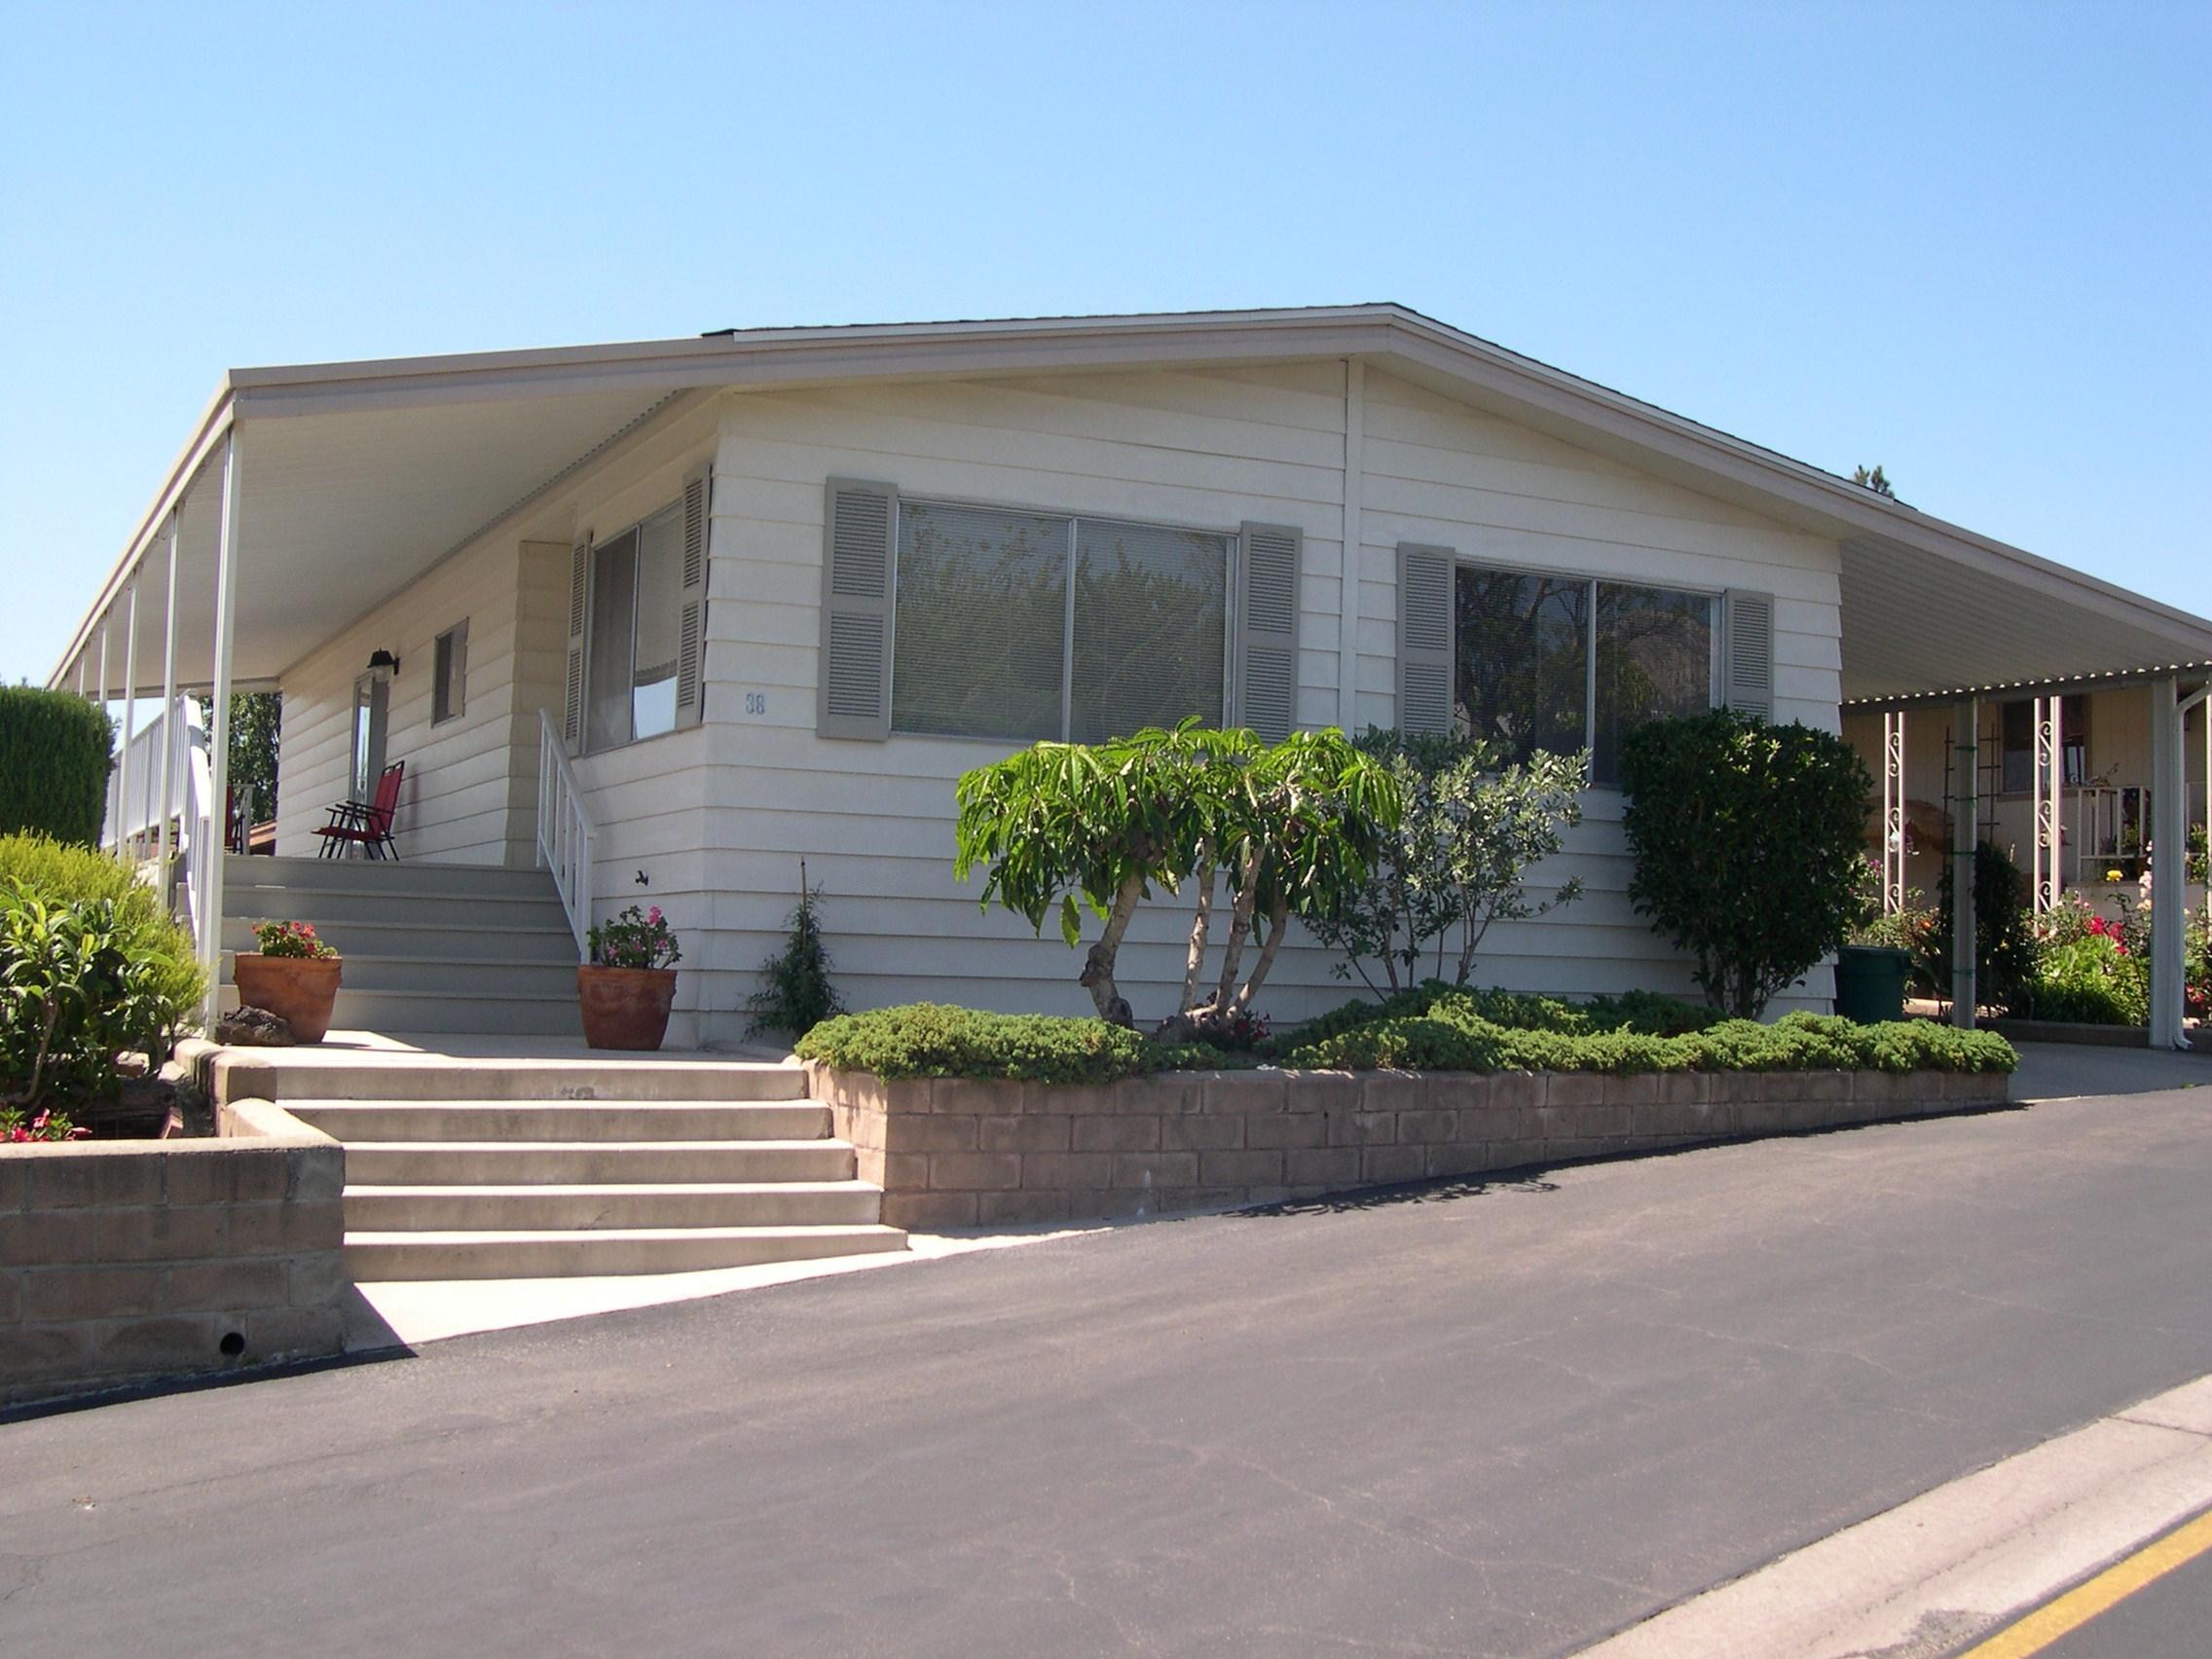 Property photo for 340 Old Mill Rd #38 Santa Barbara, California 93110 - 13-2582